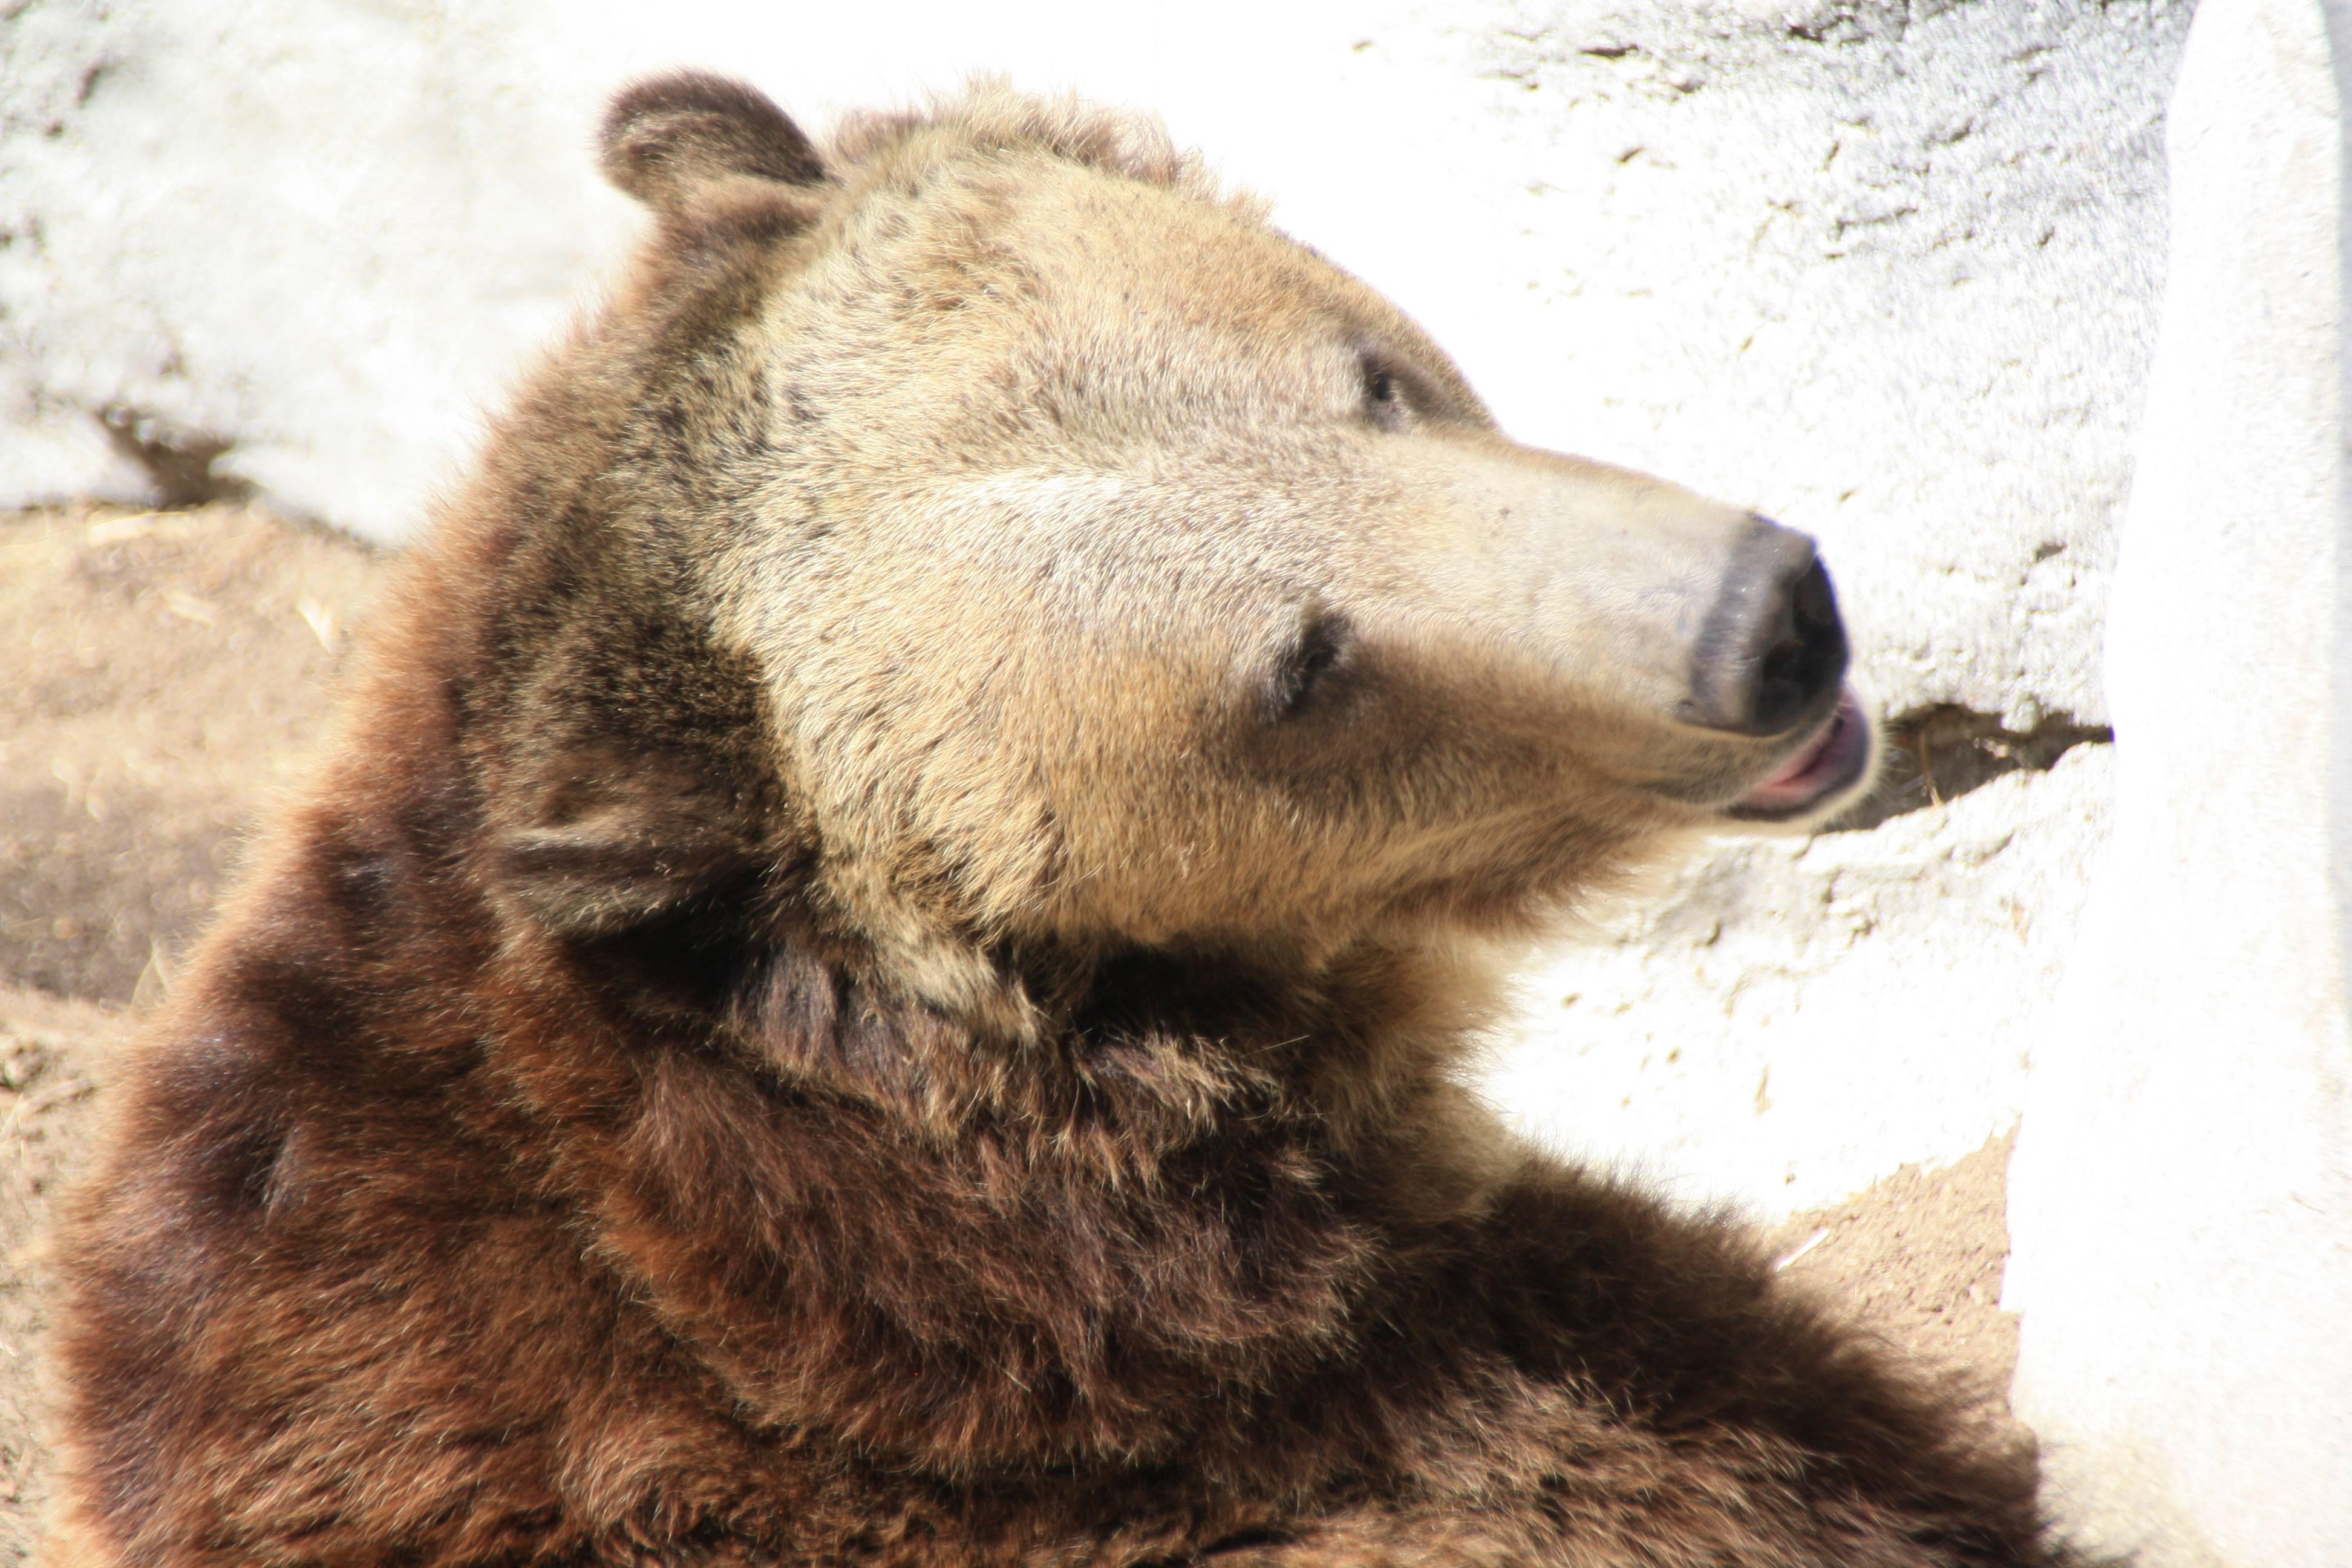 Bear at San Diego Zoo, San Diego CA